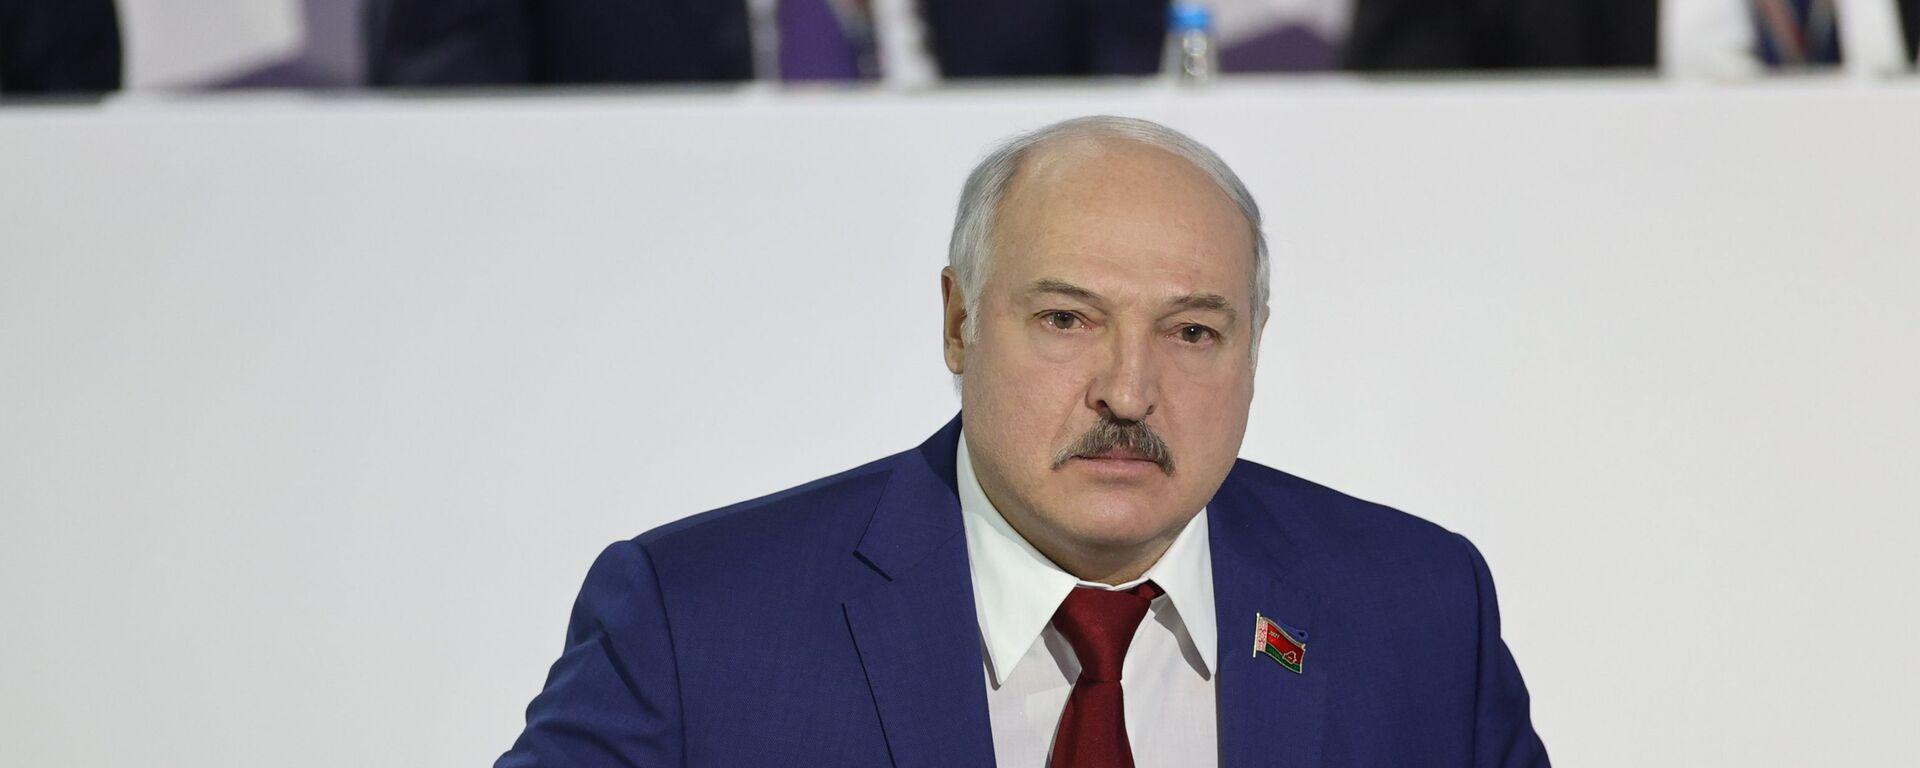 Президент Беларуси Александр Лукашенко - Sputnik Latvija, 1920, 01.04.2021